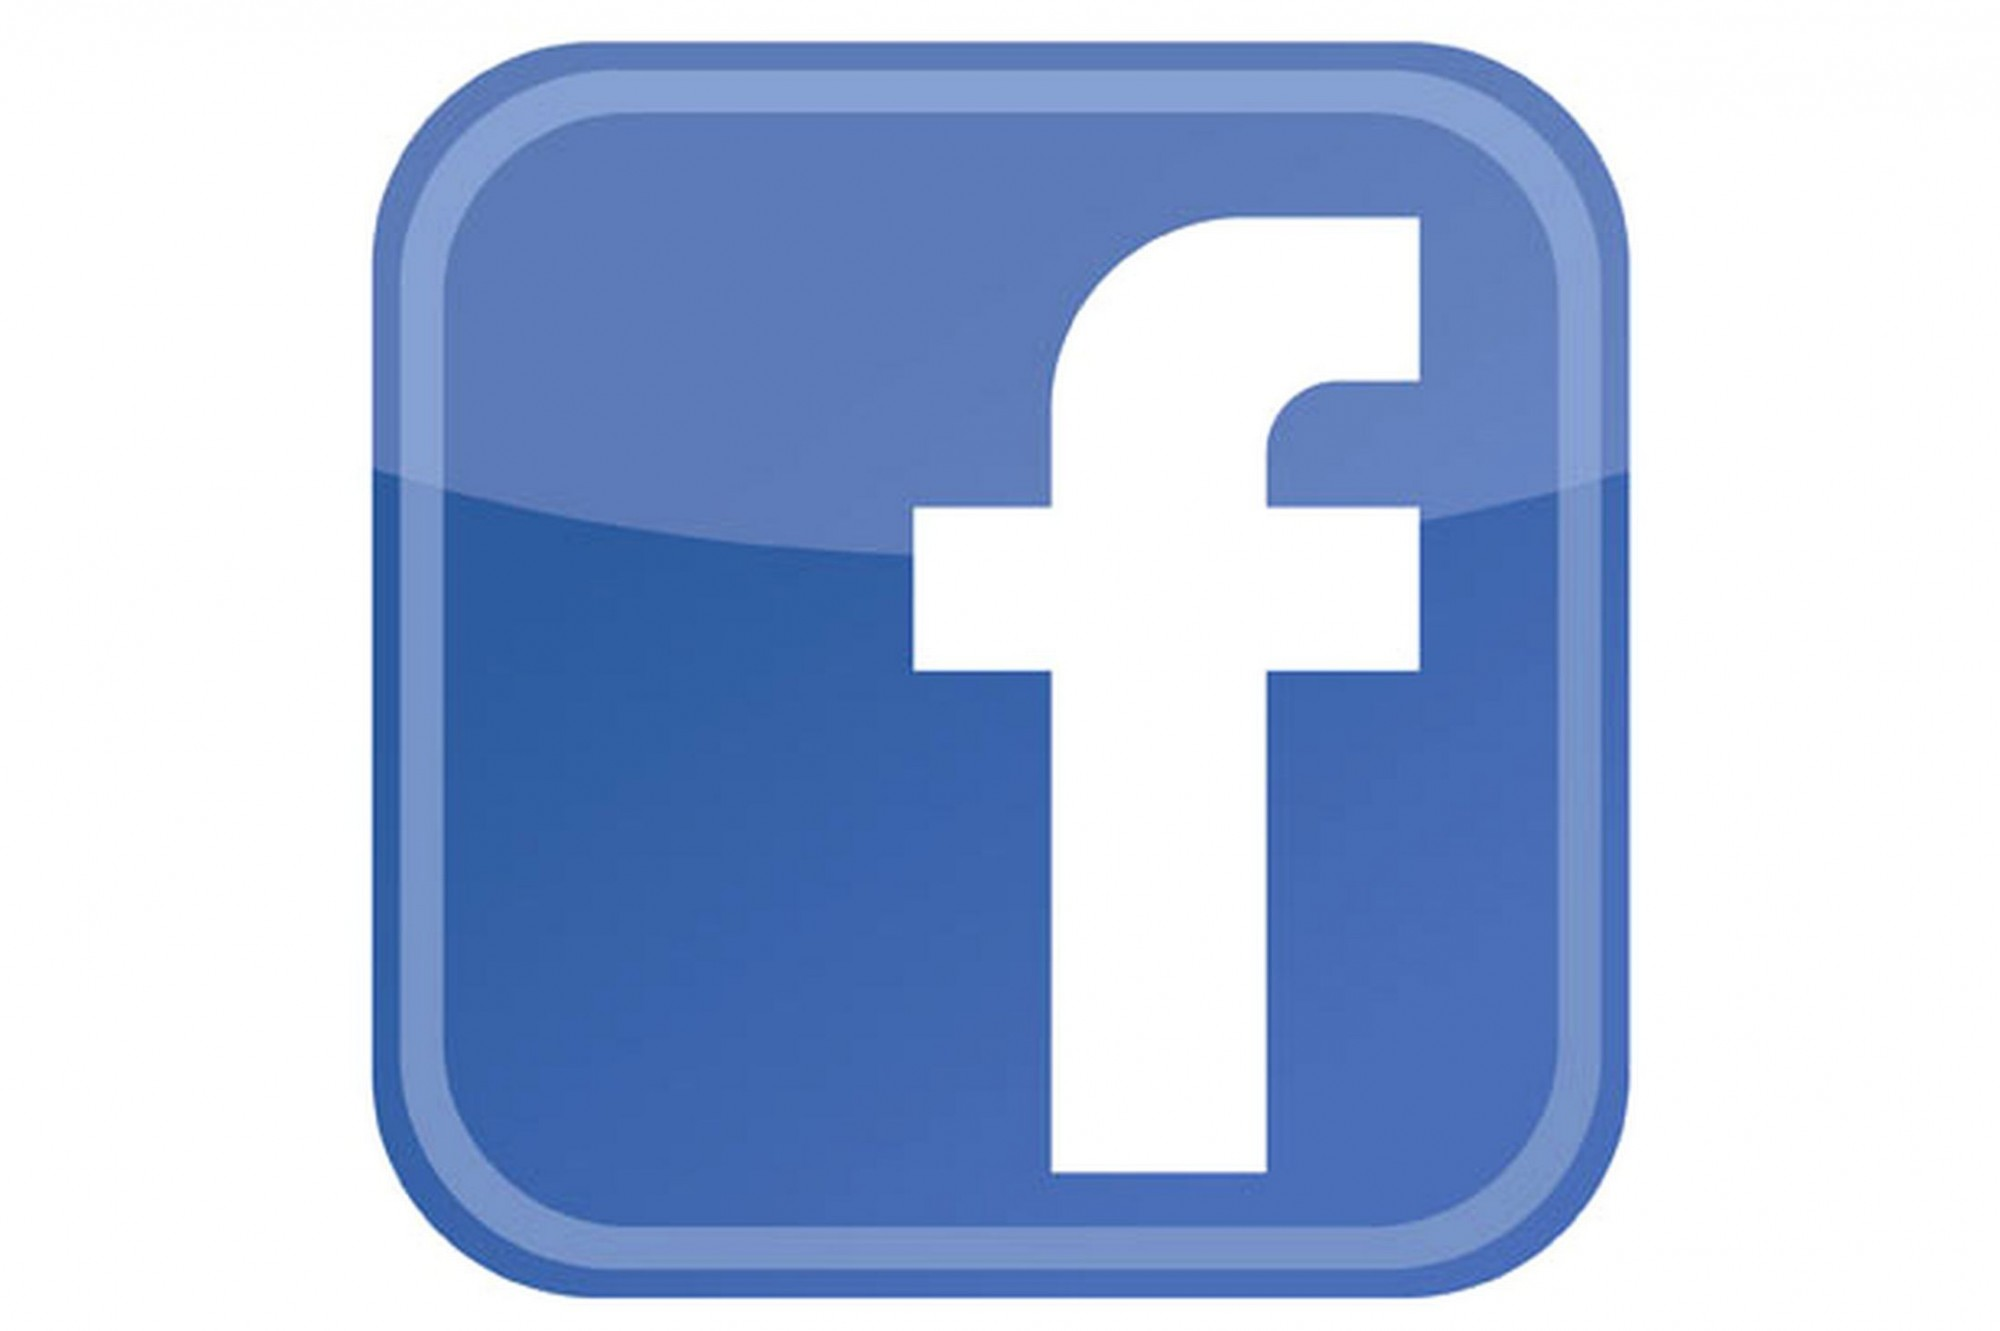 https://www.facebook.com/pages/Lavanderia-self-service-raggio-di-luna/1391829504422554?ref=hl